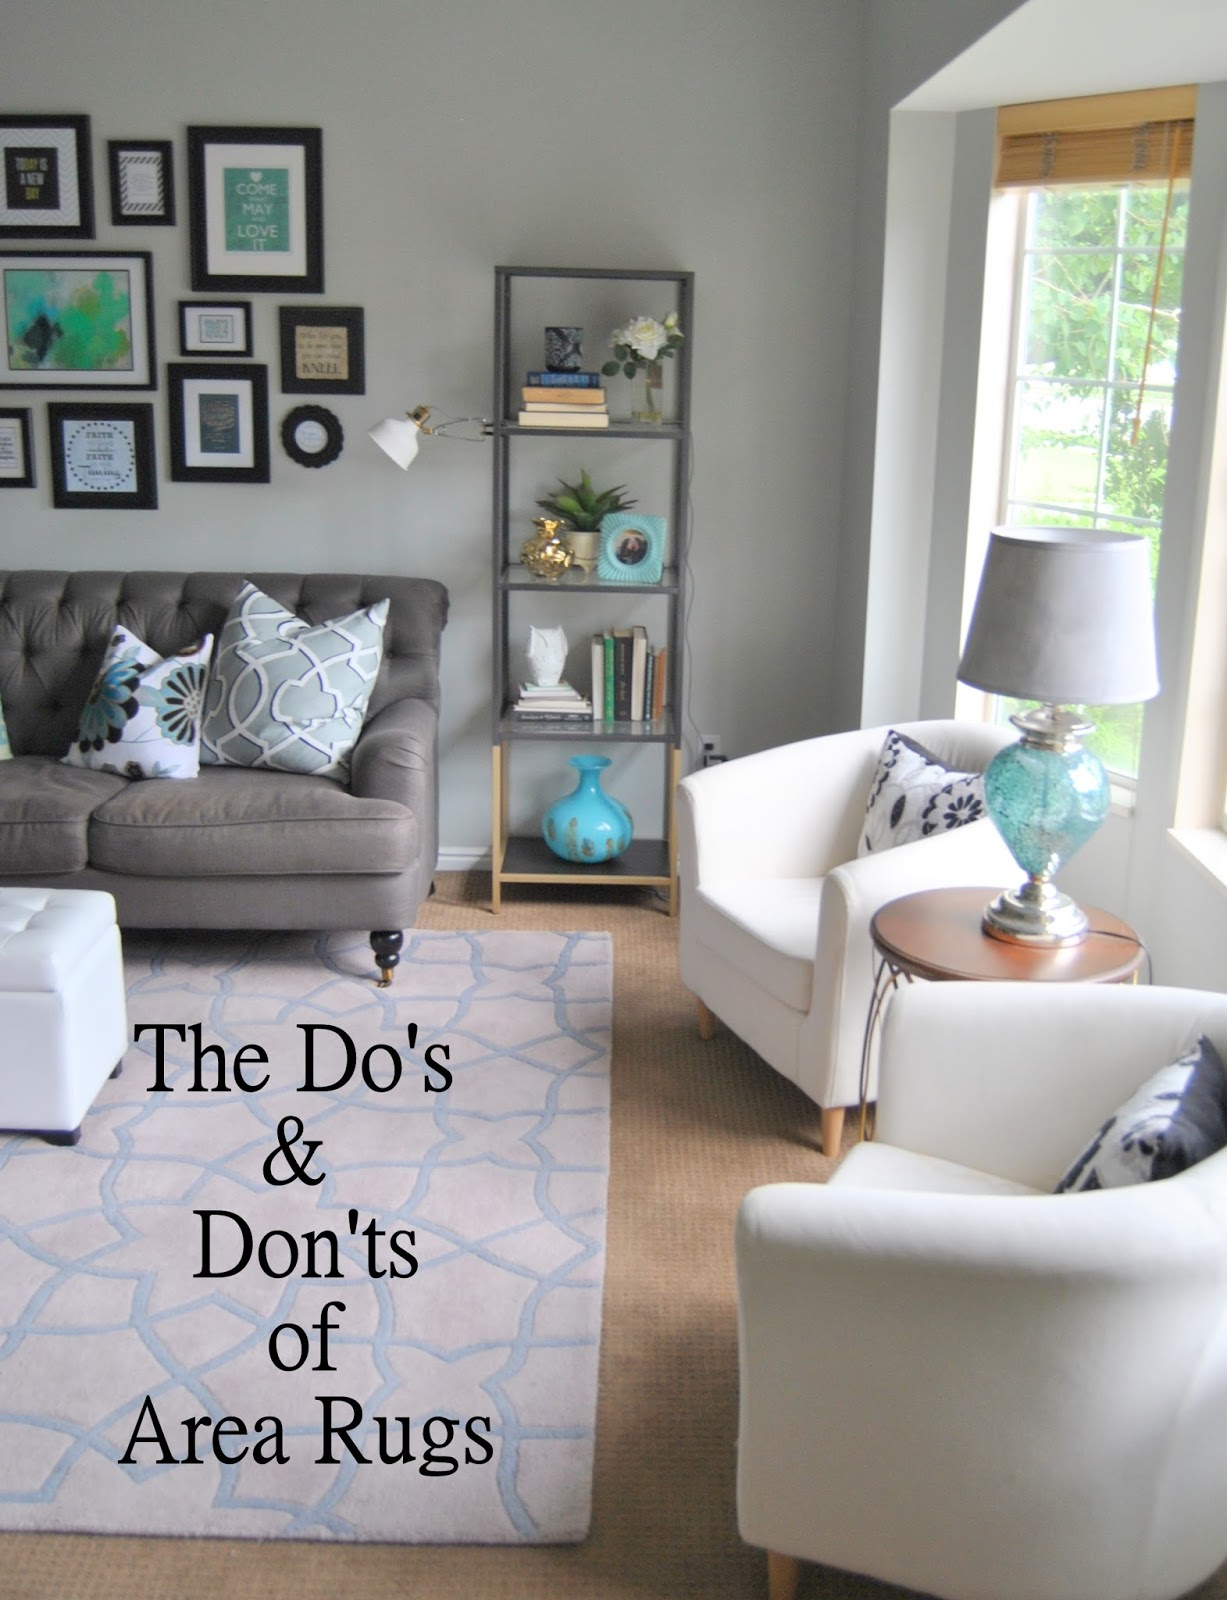 Studio 7 Interior Design: The Friday Five- Area Rugs